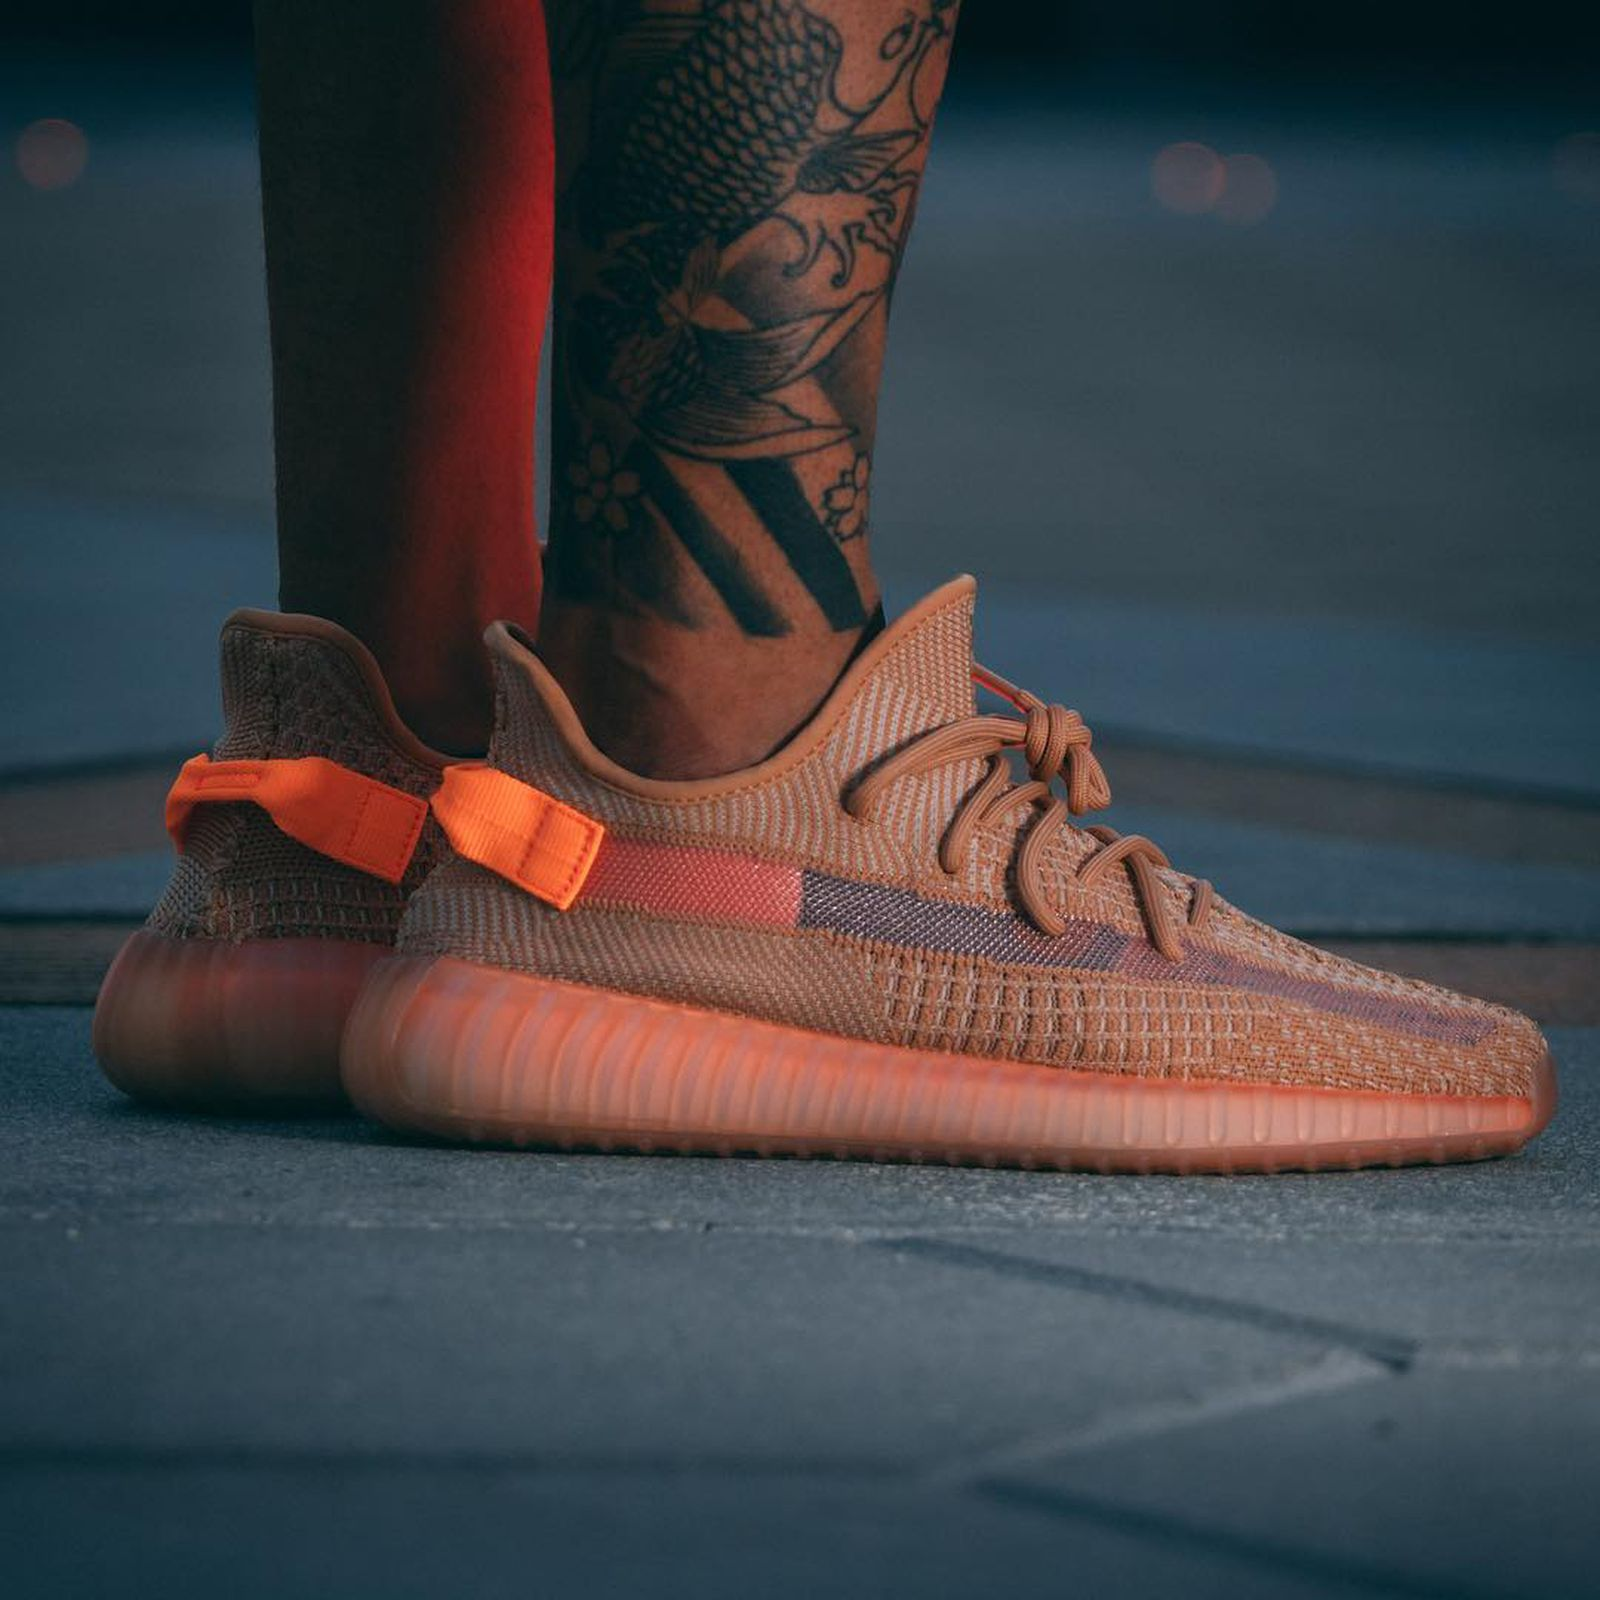 Adidas adiads originals yeezy boost 350 v2